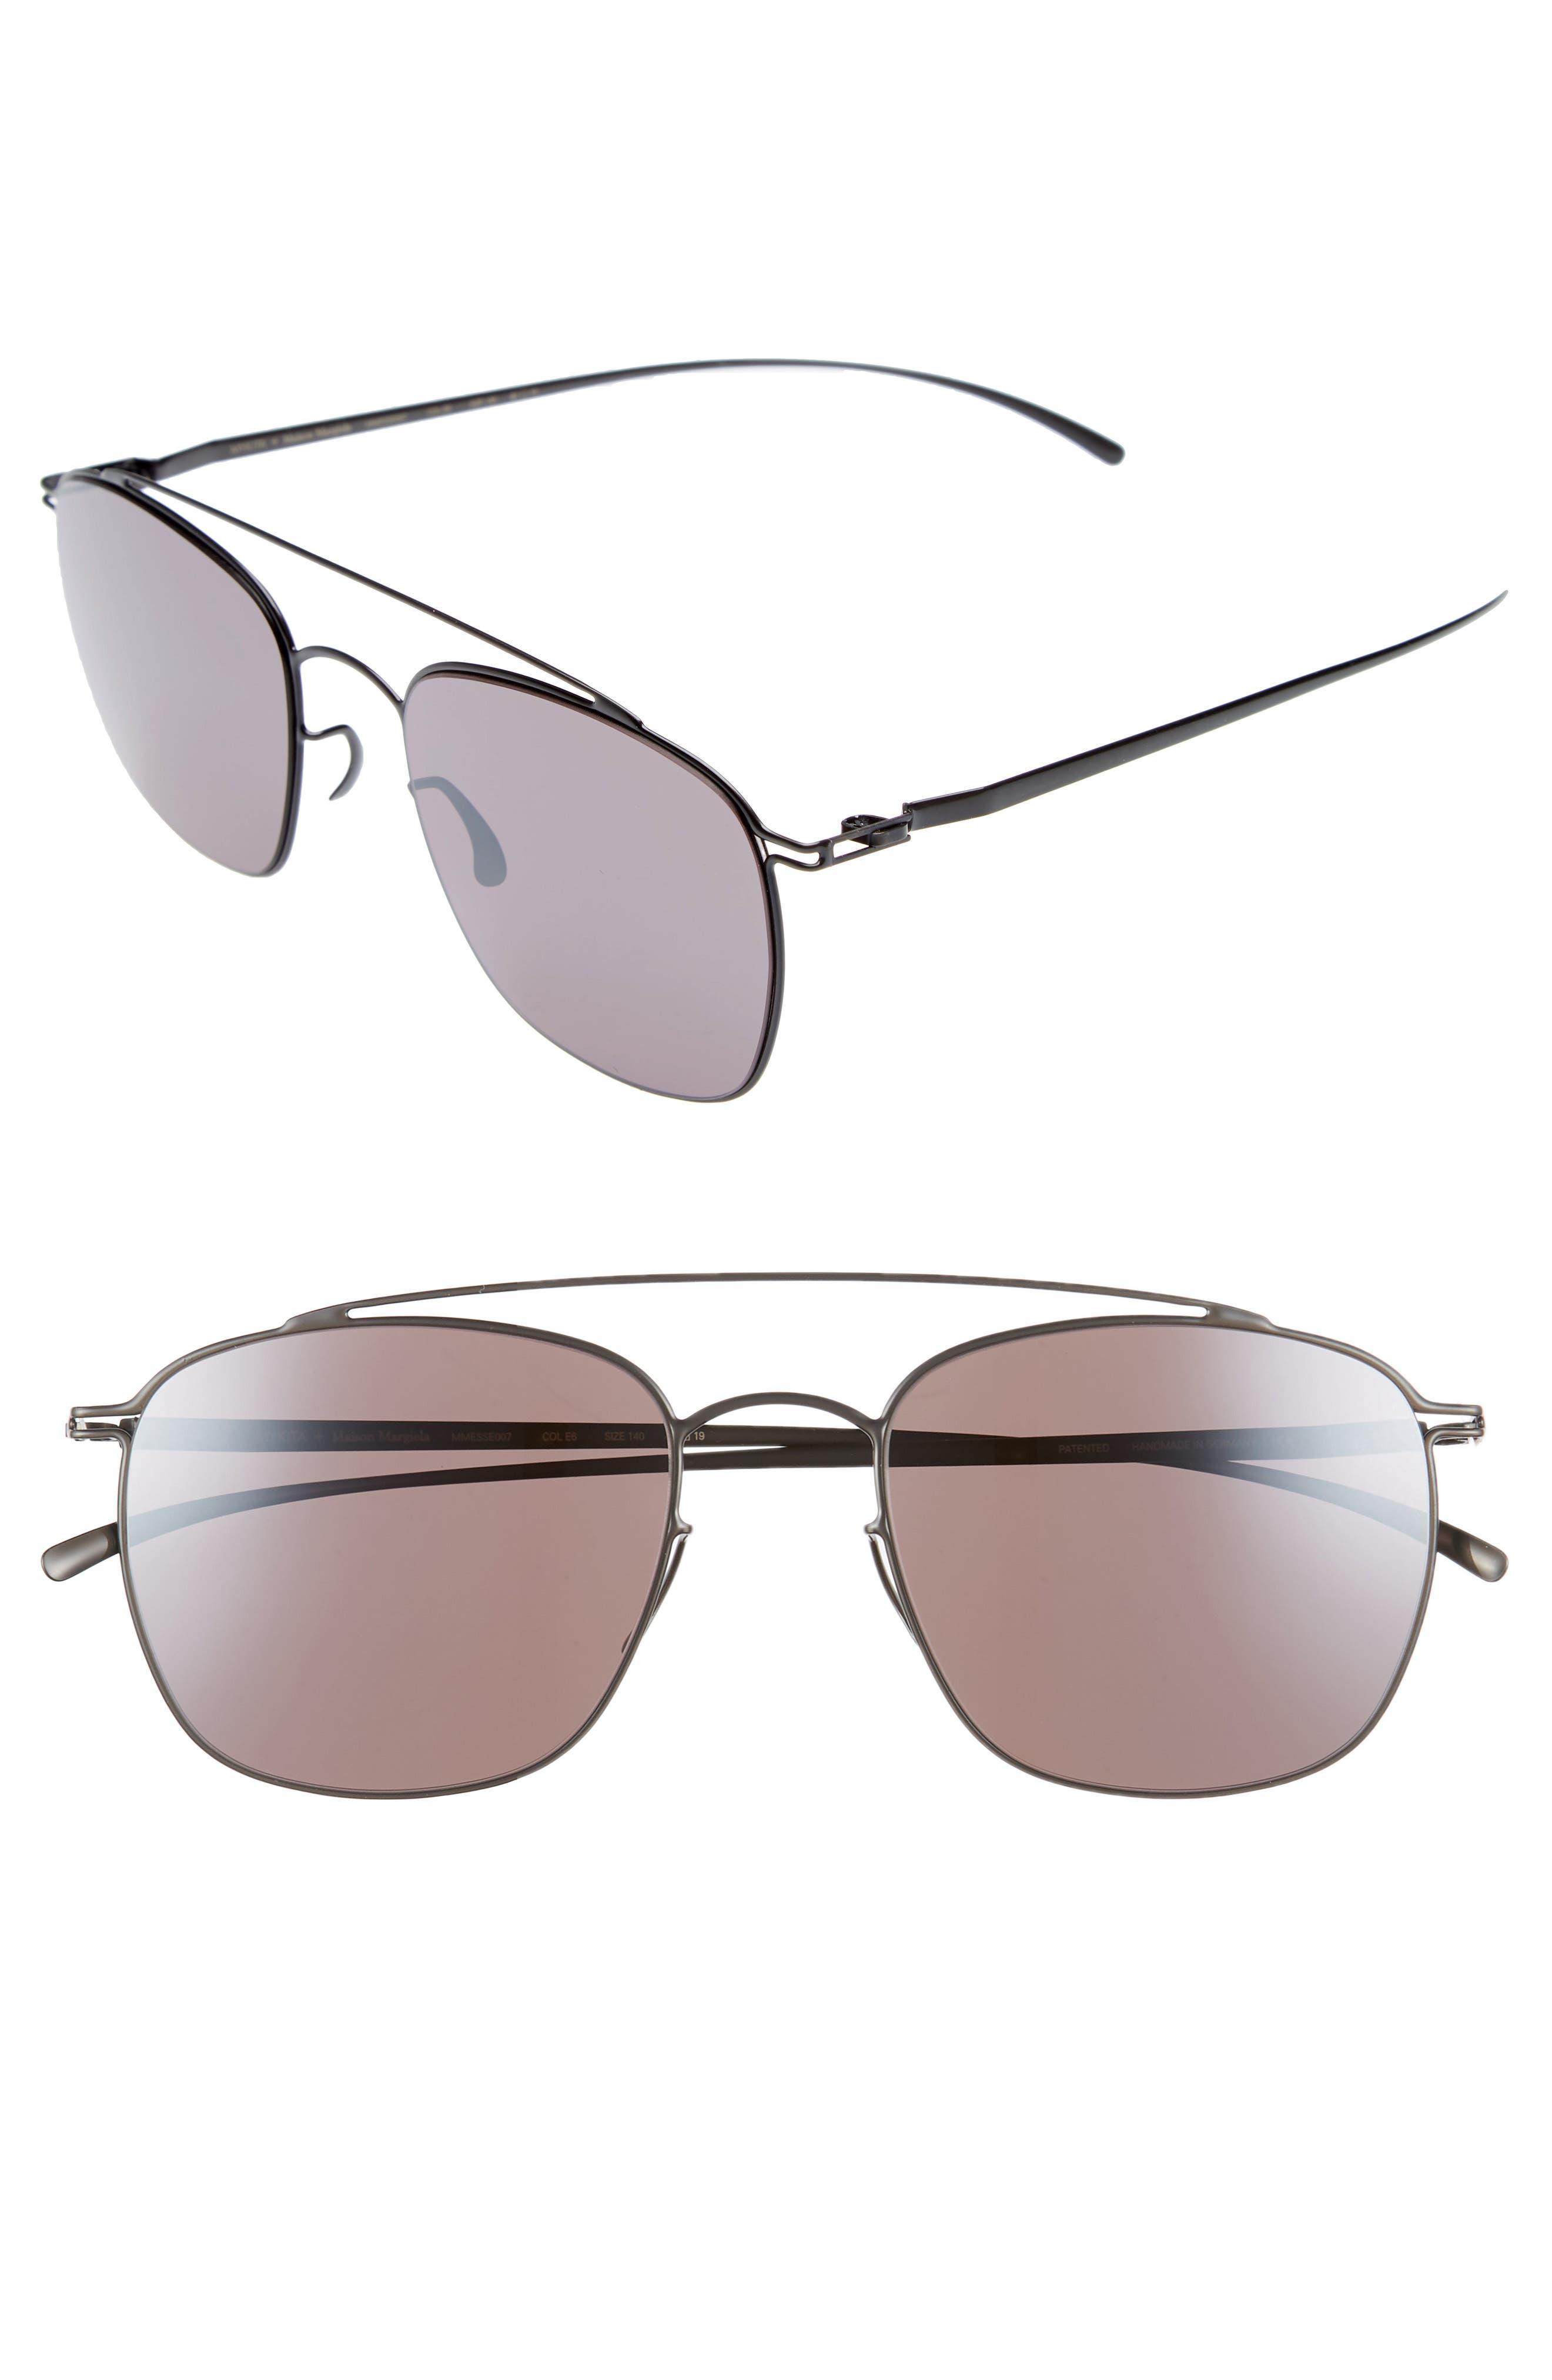 MMESSE007 51mm Aviator Sunglasses,                             Main thumbnail 1, color,